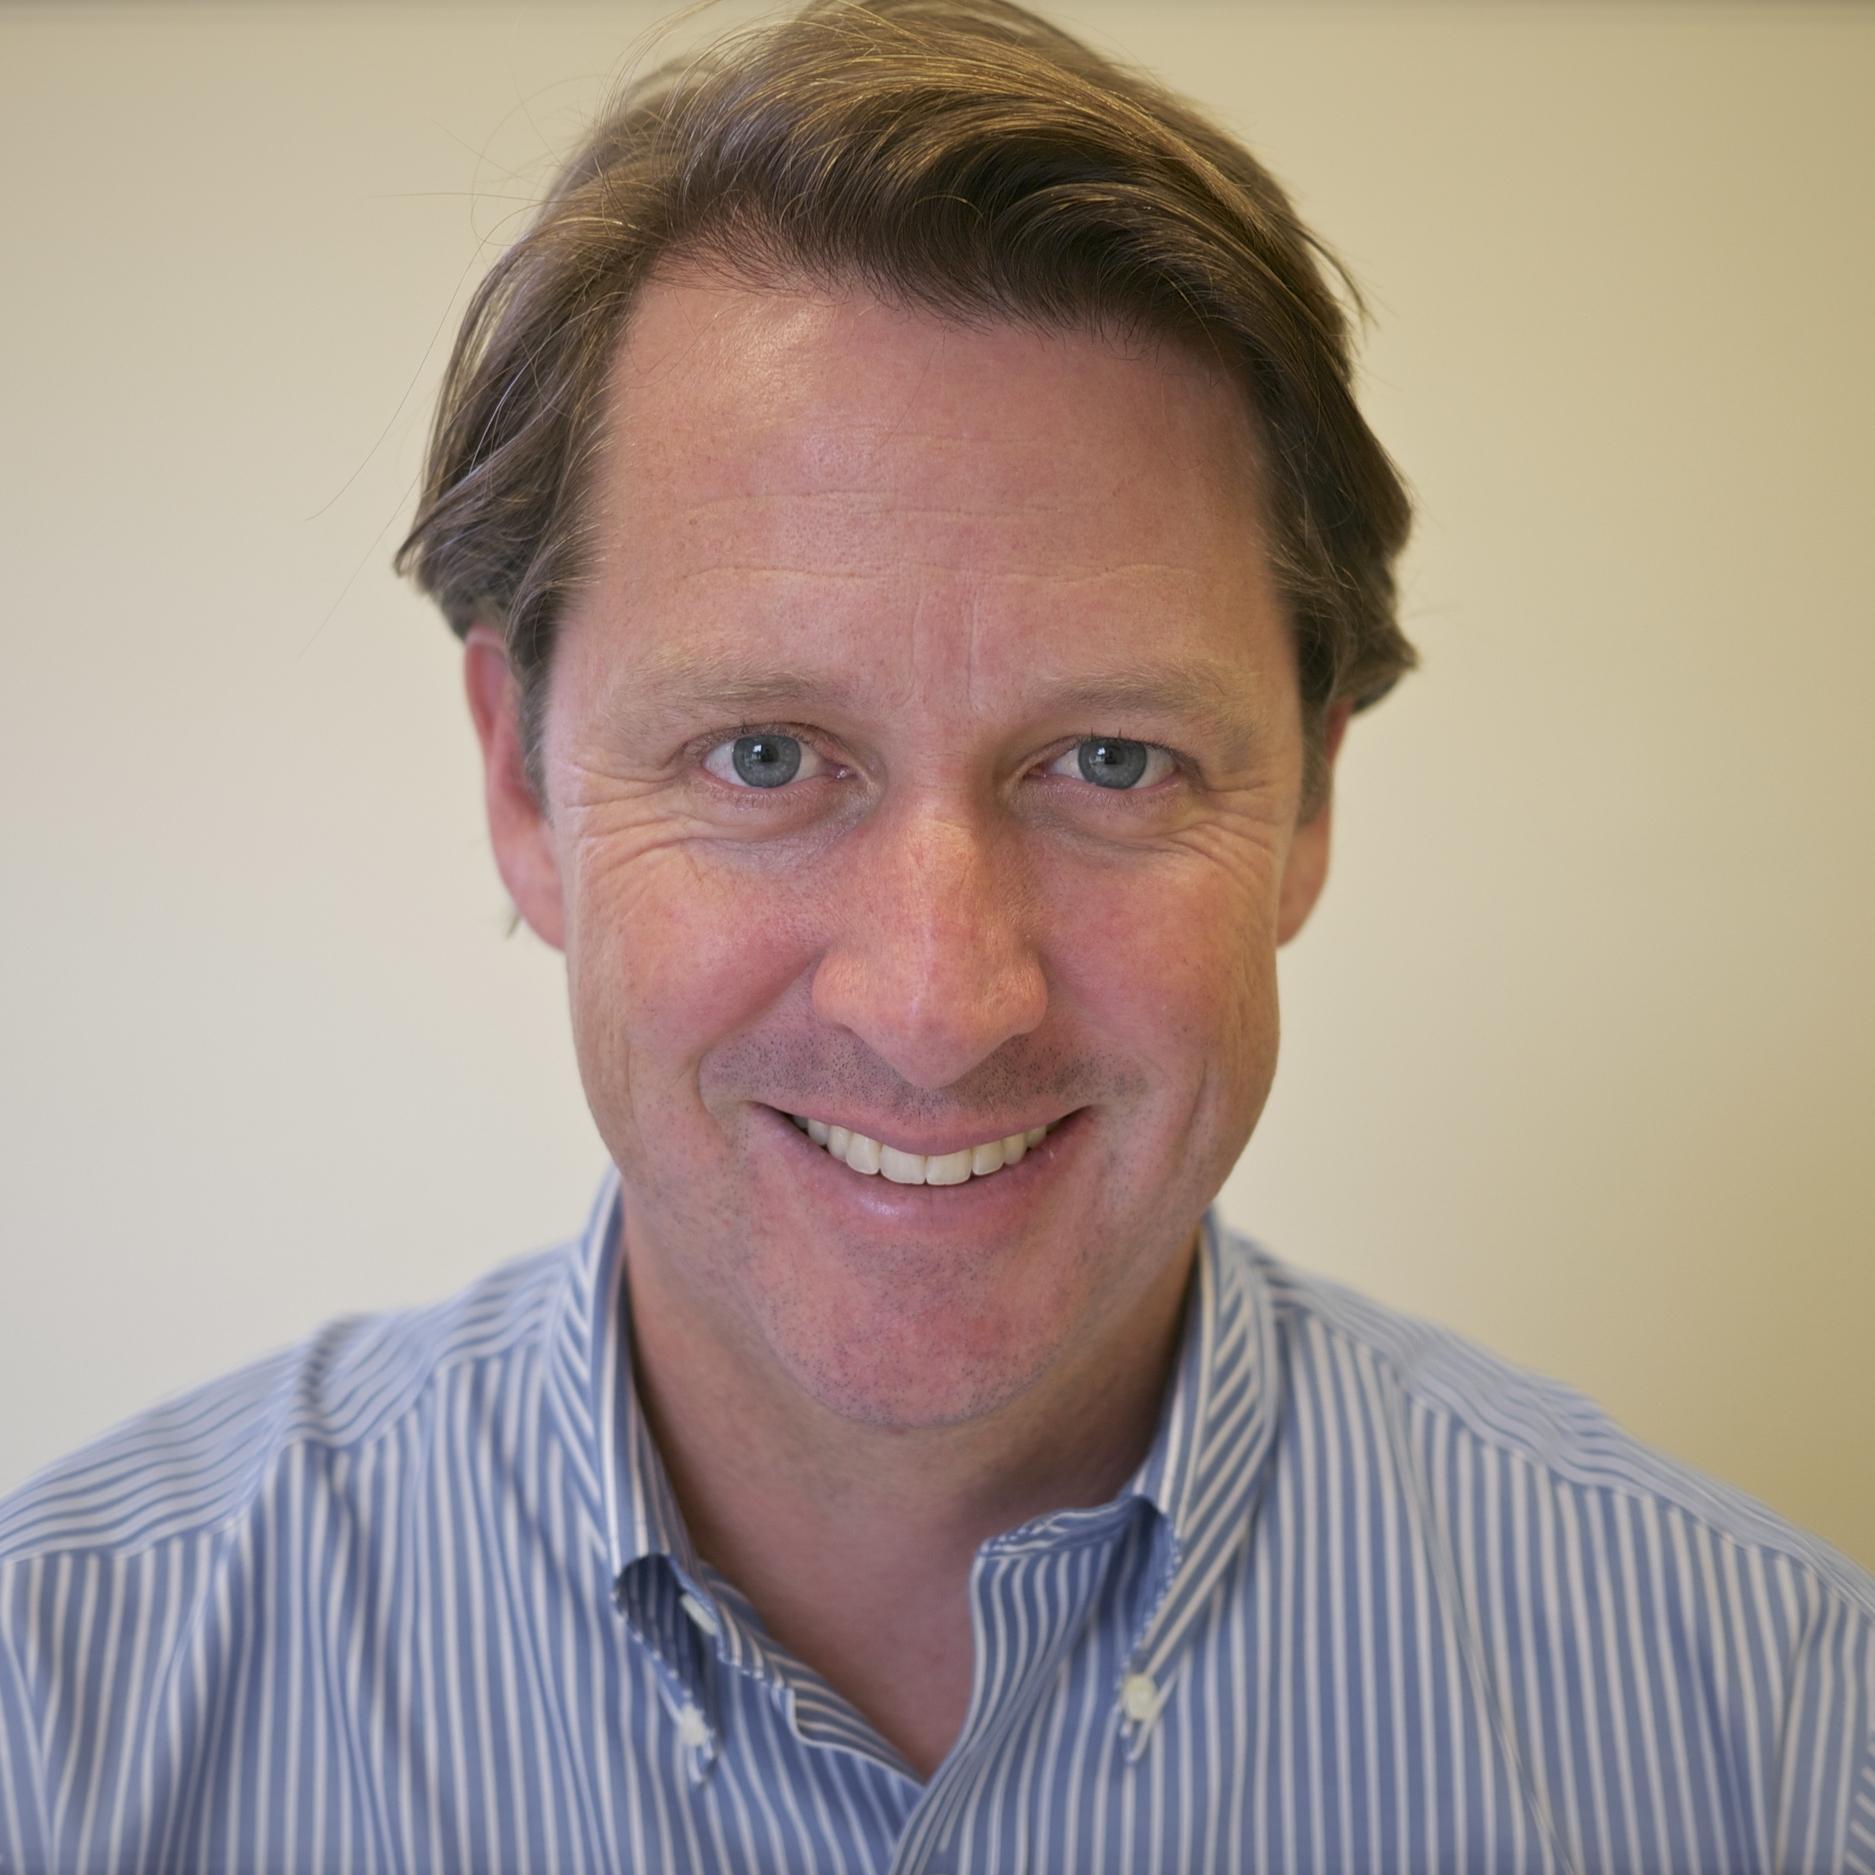 daniel emmett, CEO - Next energy technologies